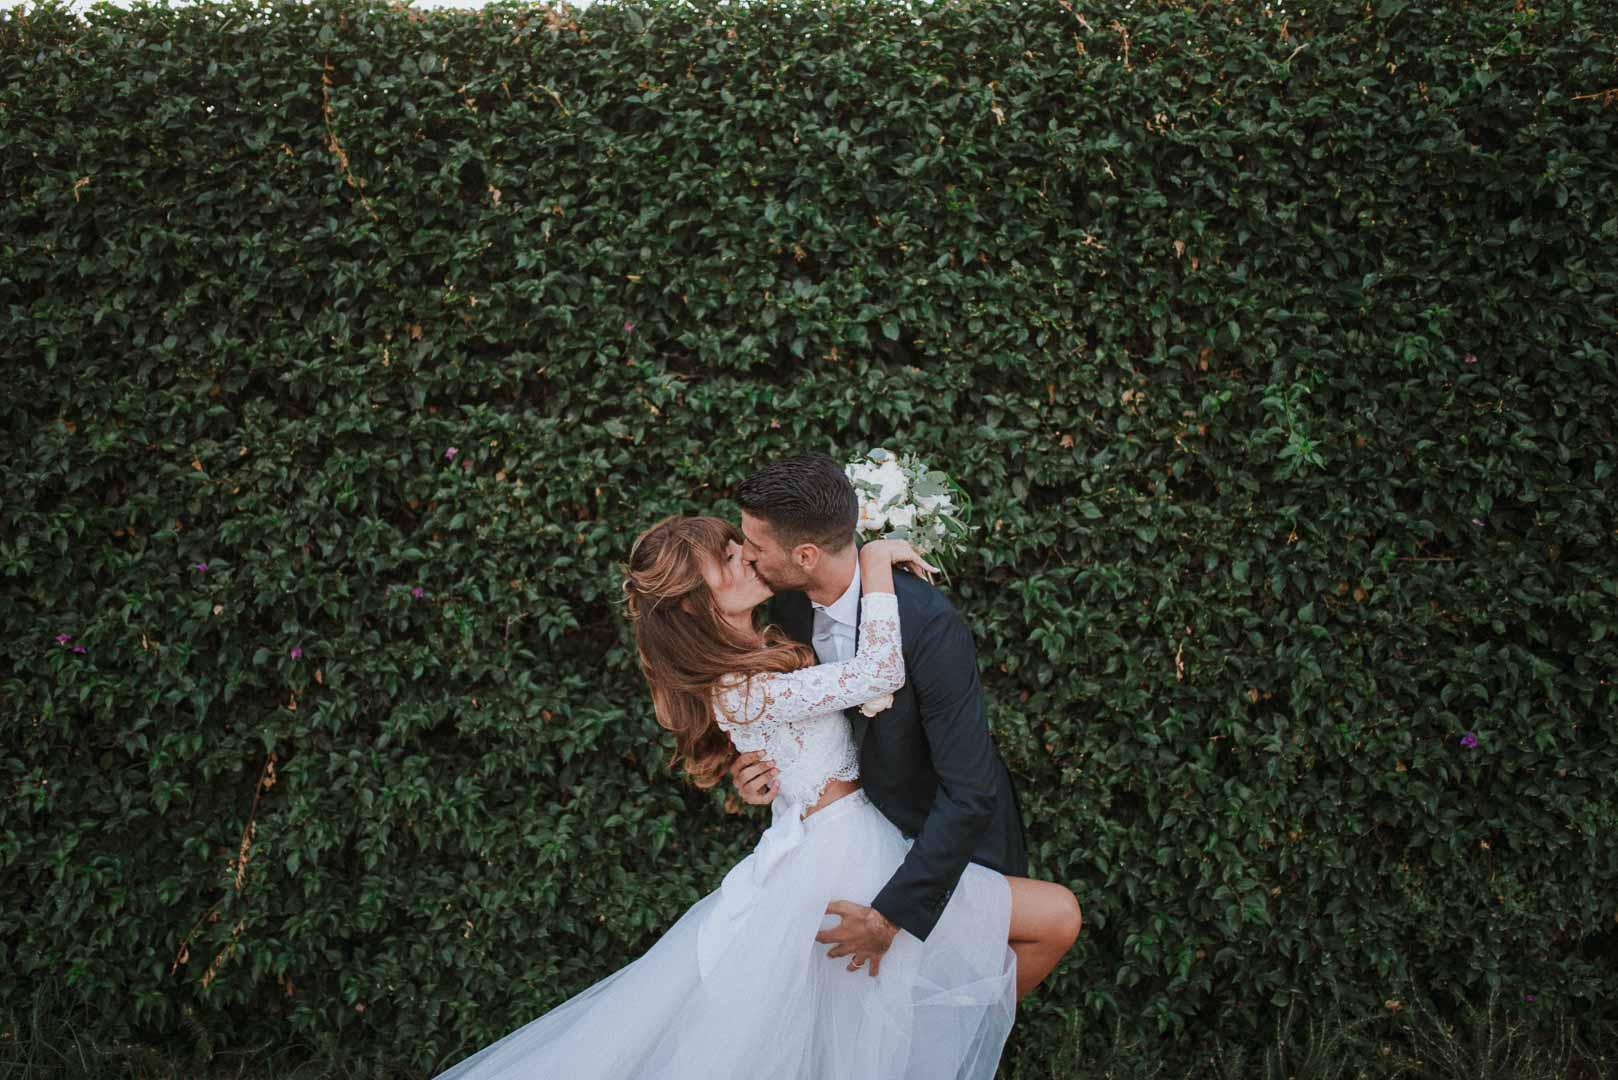 wedding-photographer-destination-fineart-bespoke-reportage-napoli-nabilah-vivianeizzo-spazio46-100